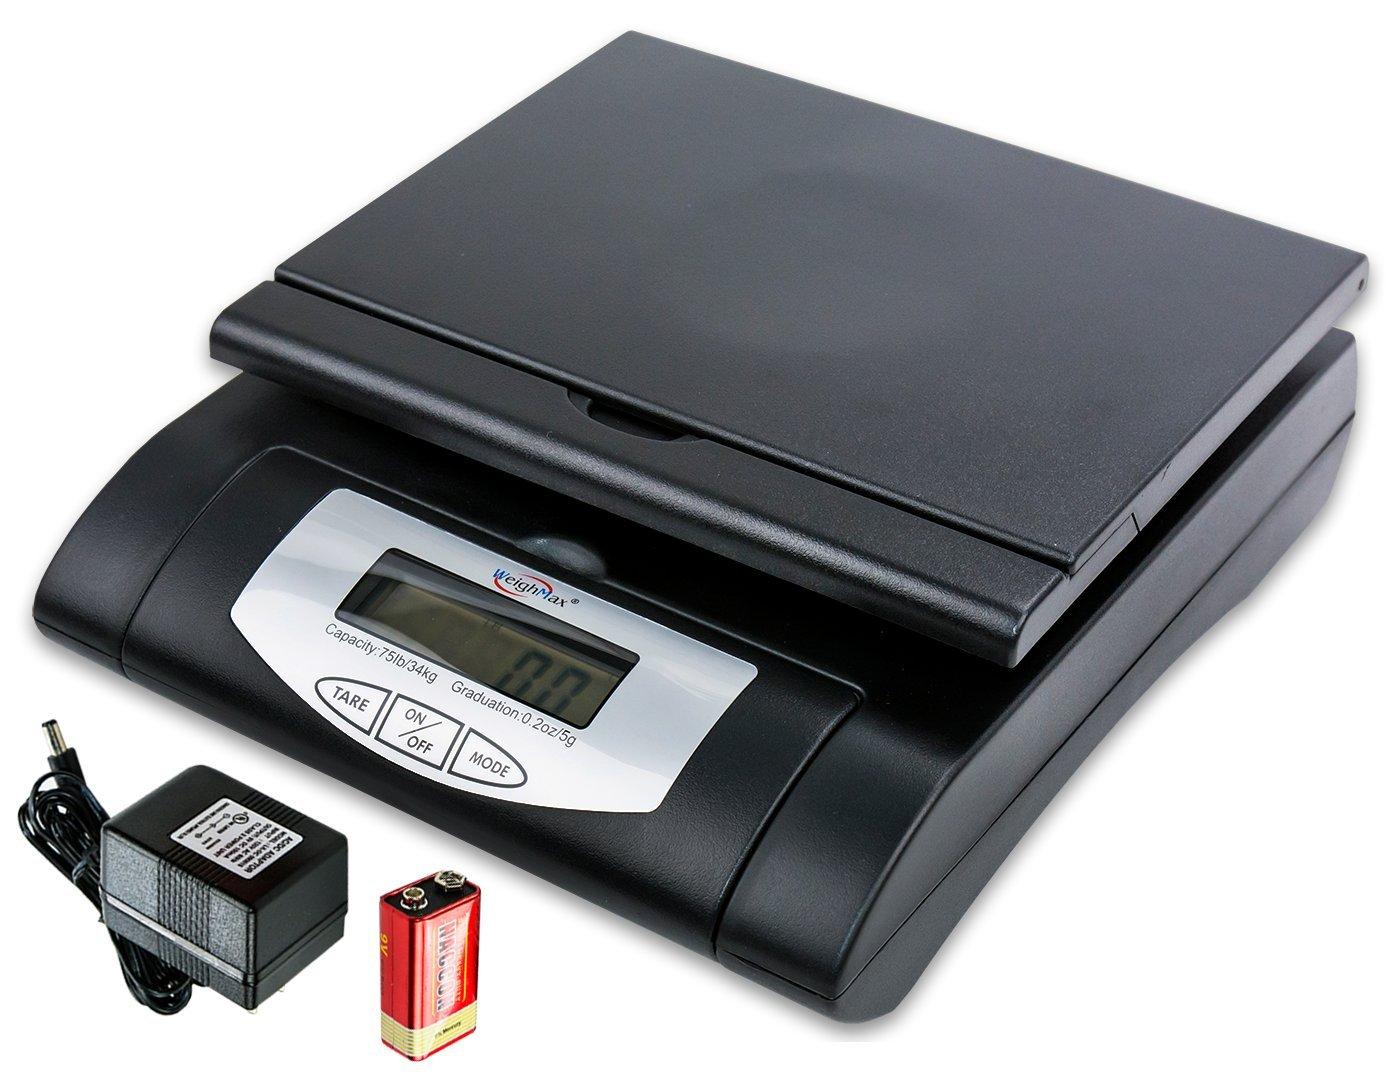 Weighmax 75 lbs. Digital Shipping Postal Scale, Black (W-4819-75 BLACK)